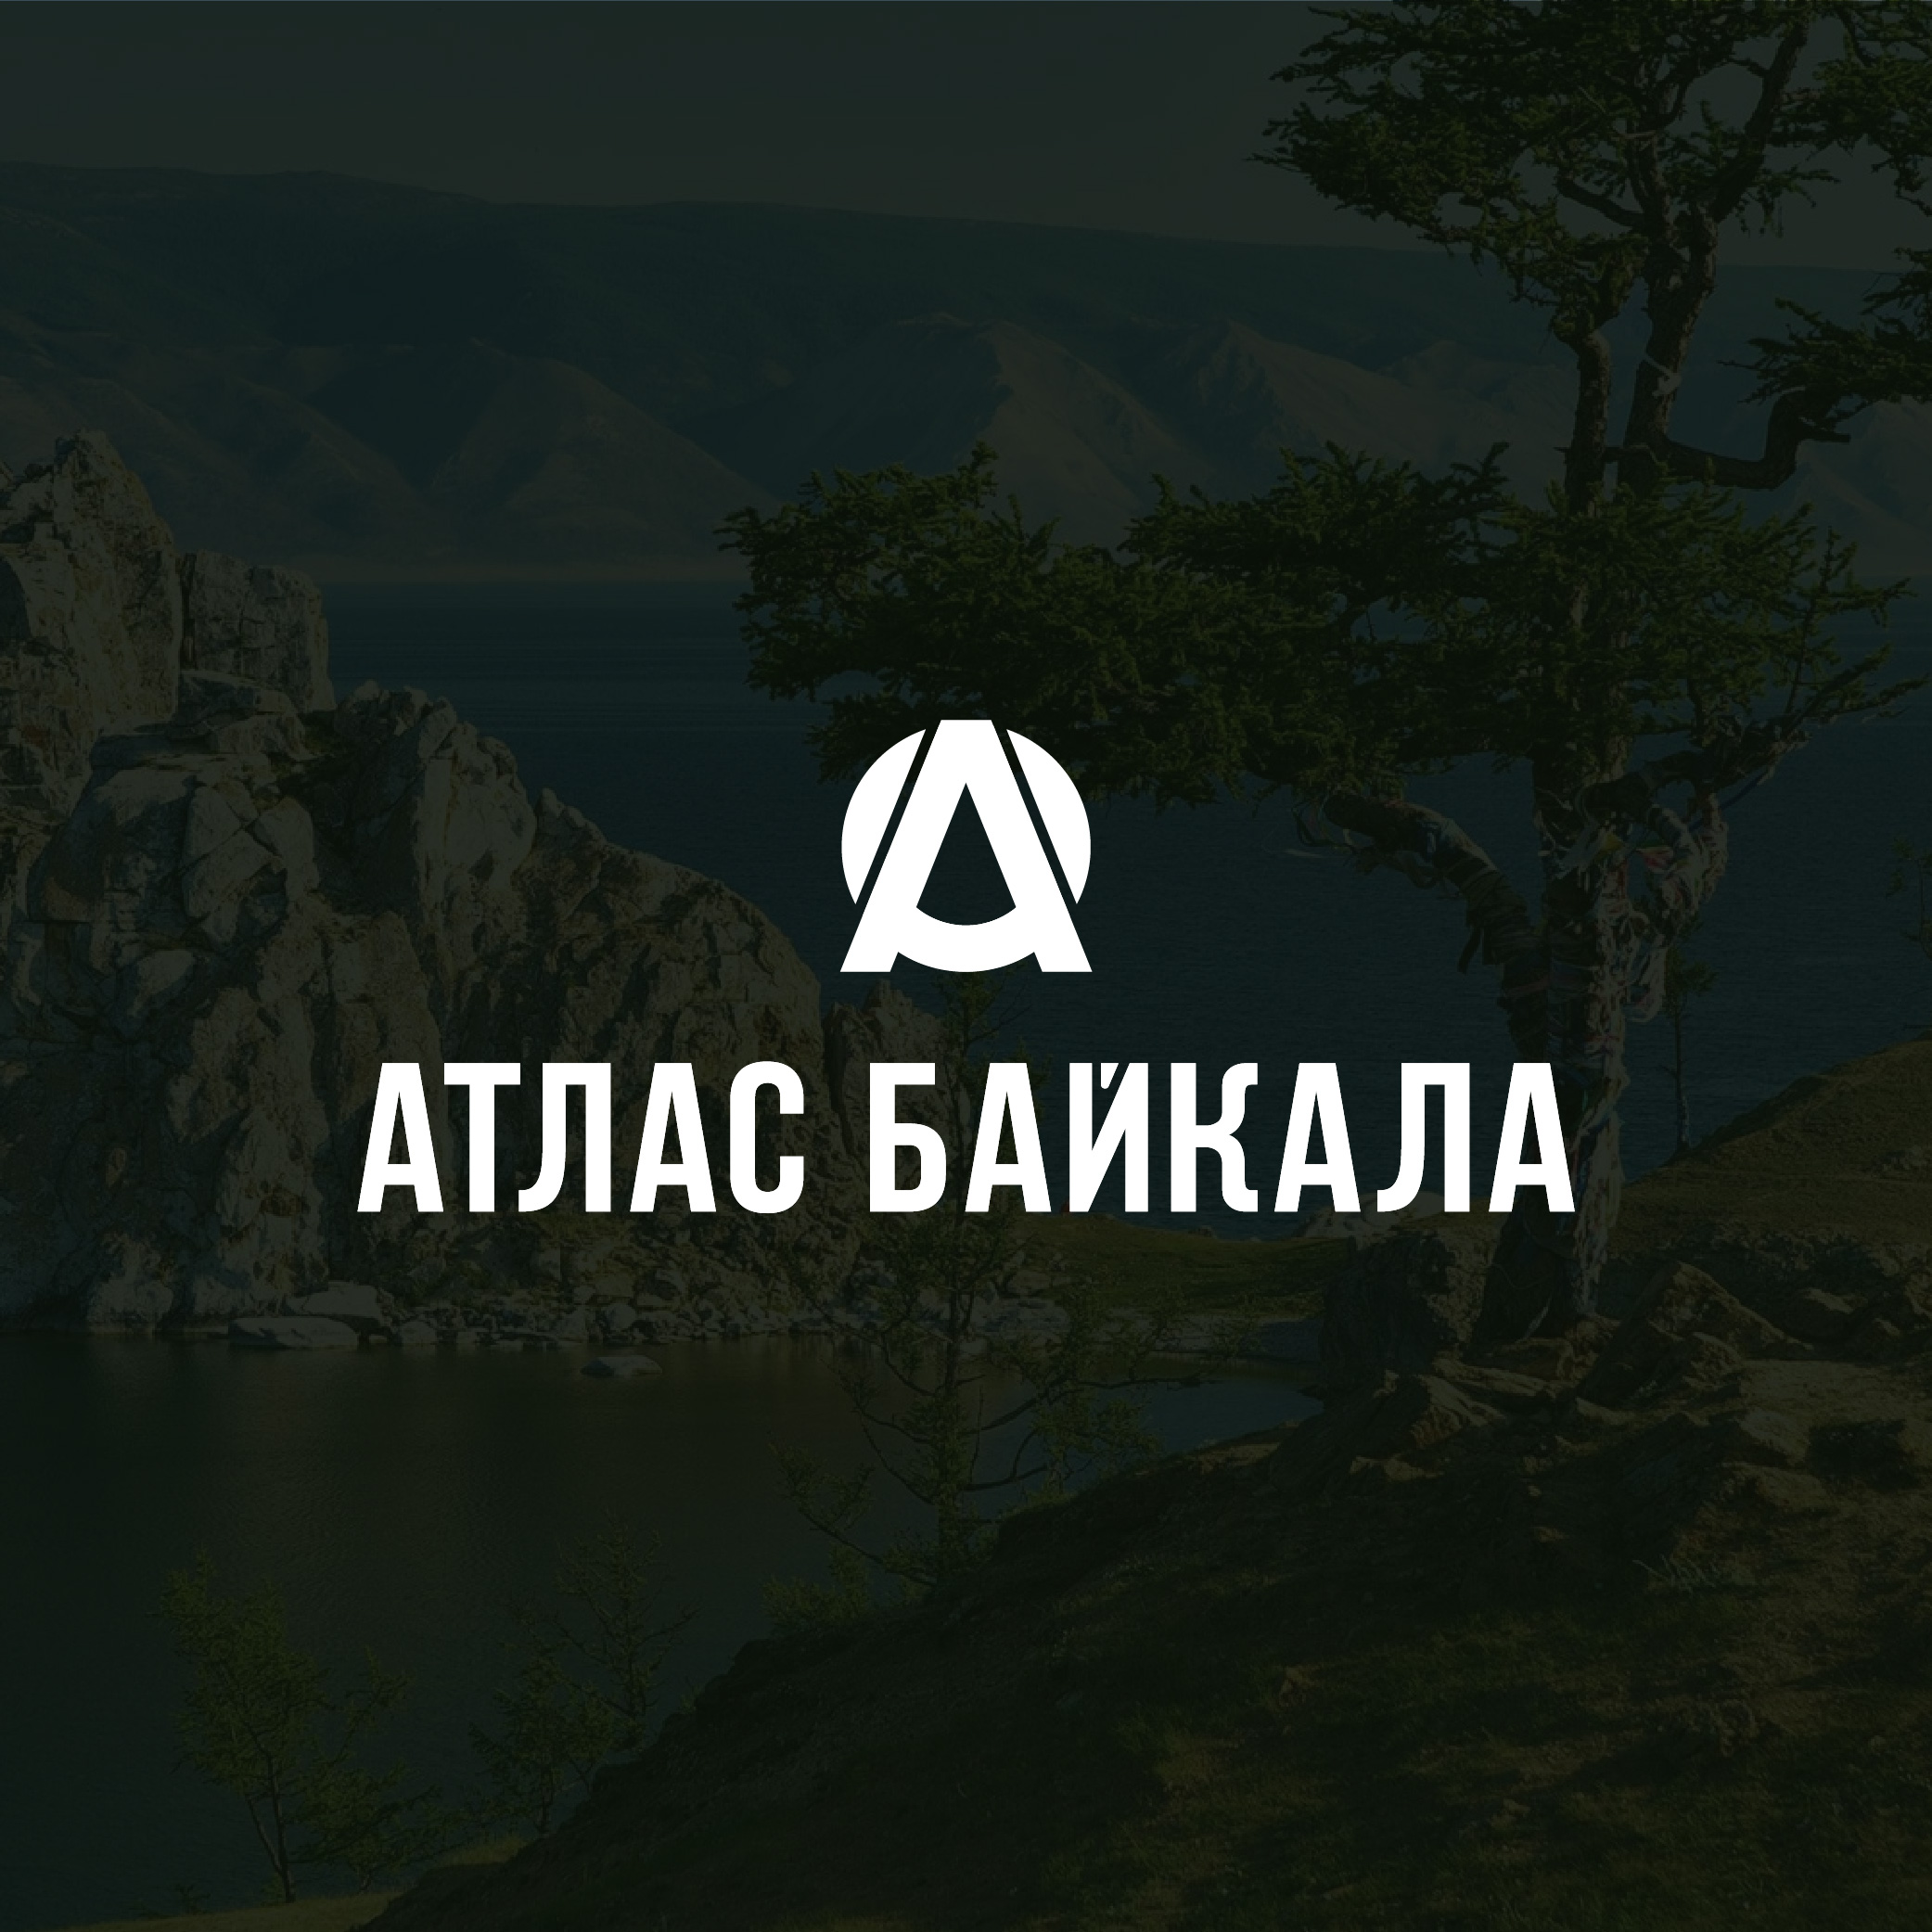 Разработка логотипа Атлас Байкала фото f_5475afc8d4ec1012.jpg